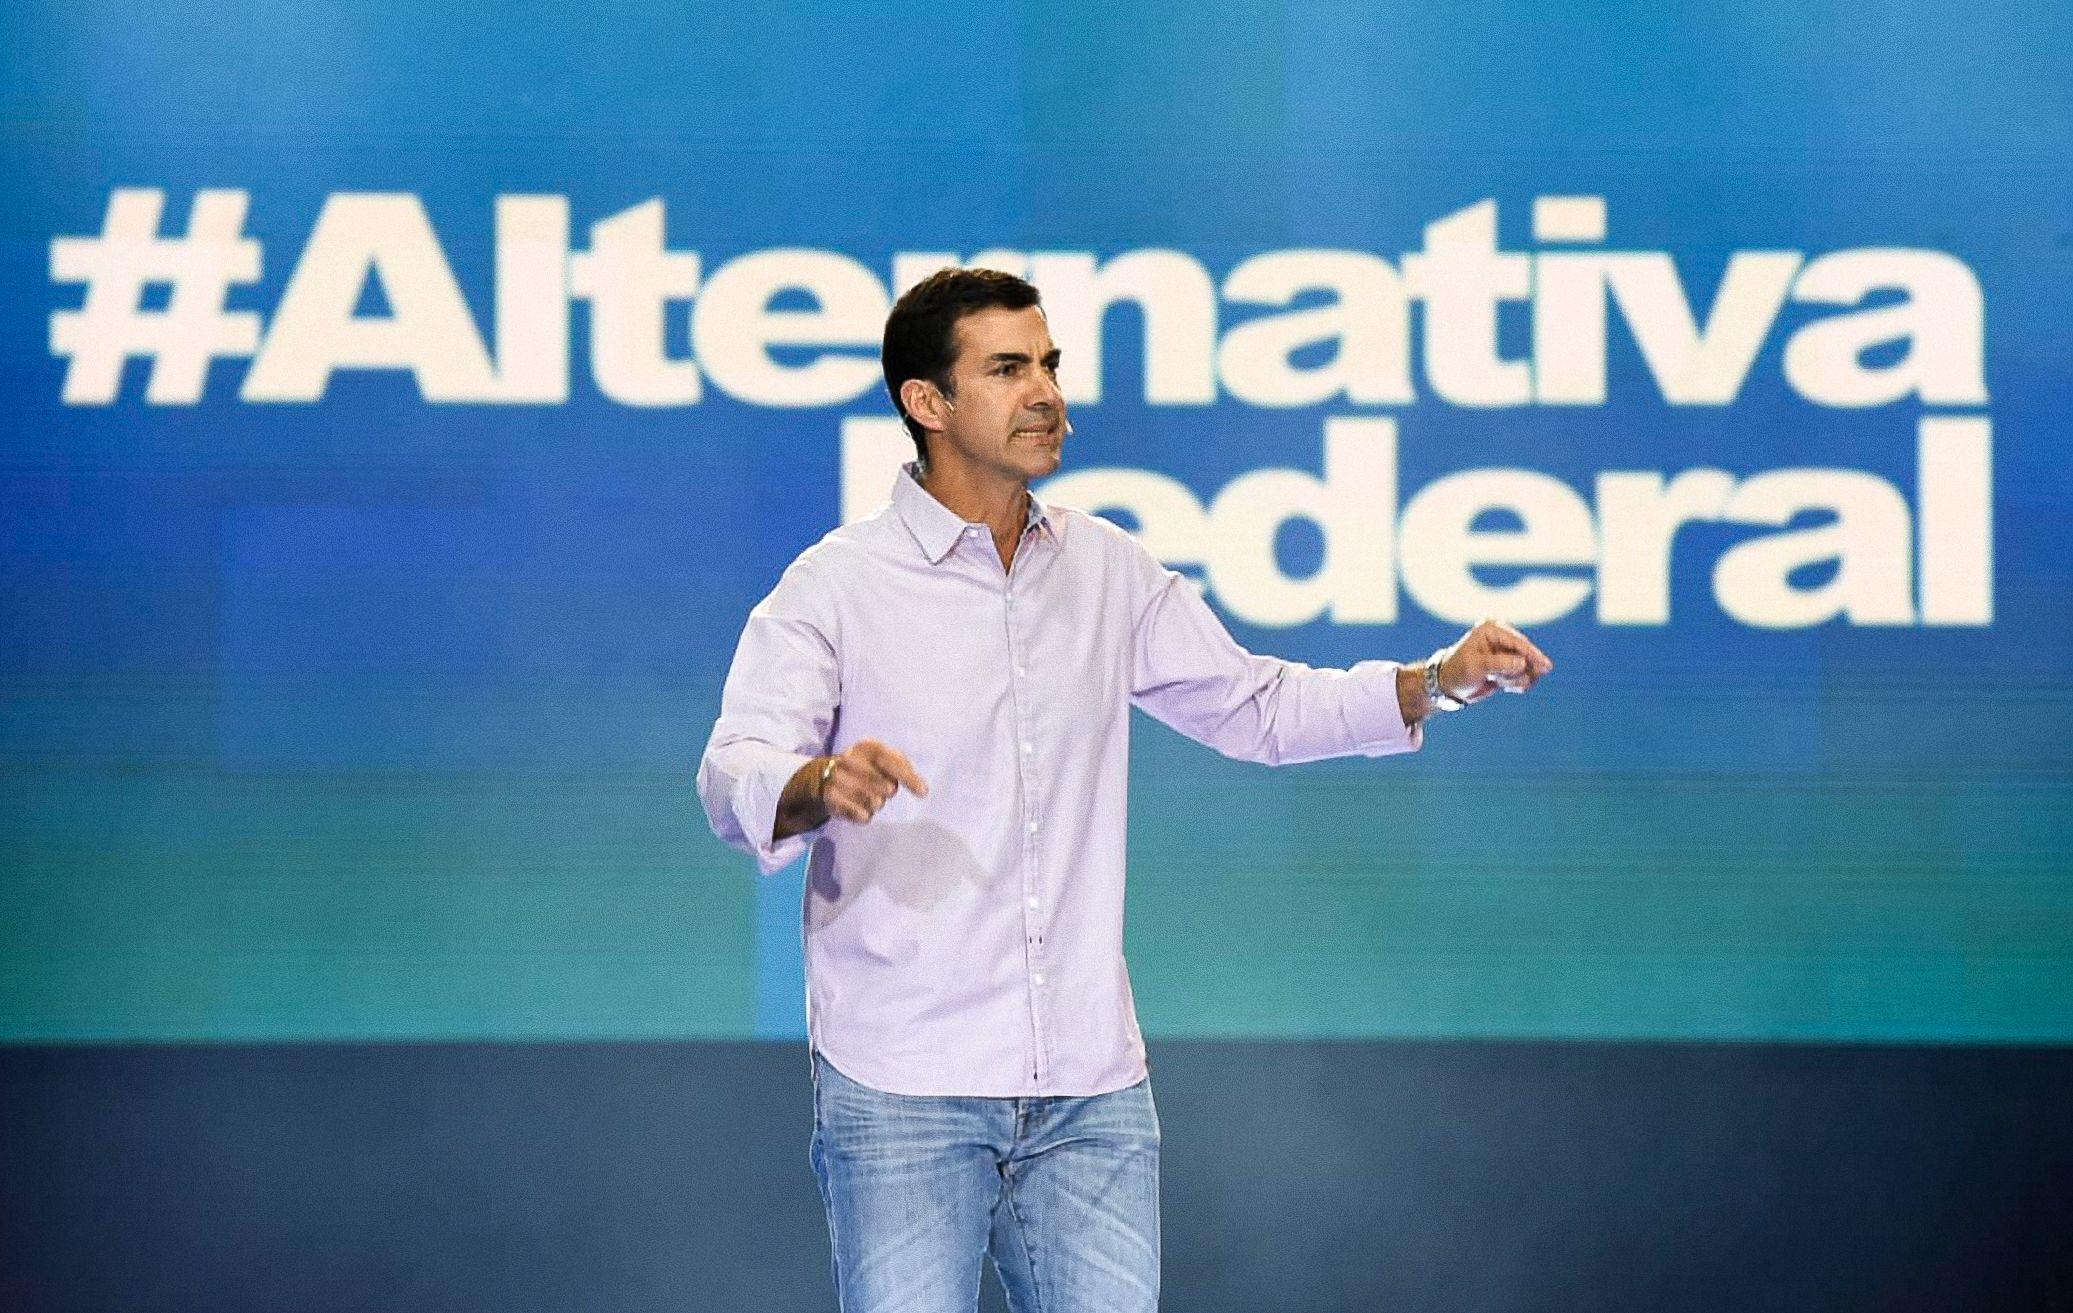 Ni Macri ni Cristina: Juan Manuel Urtubey ratificó su precandidatura presidencial